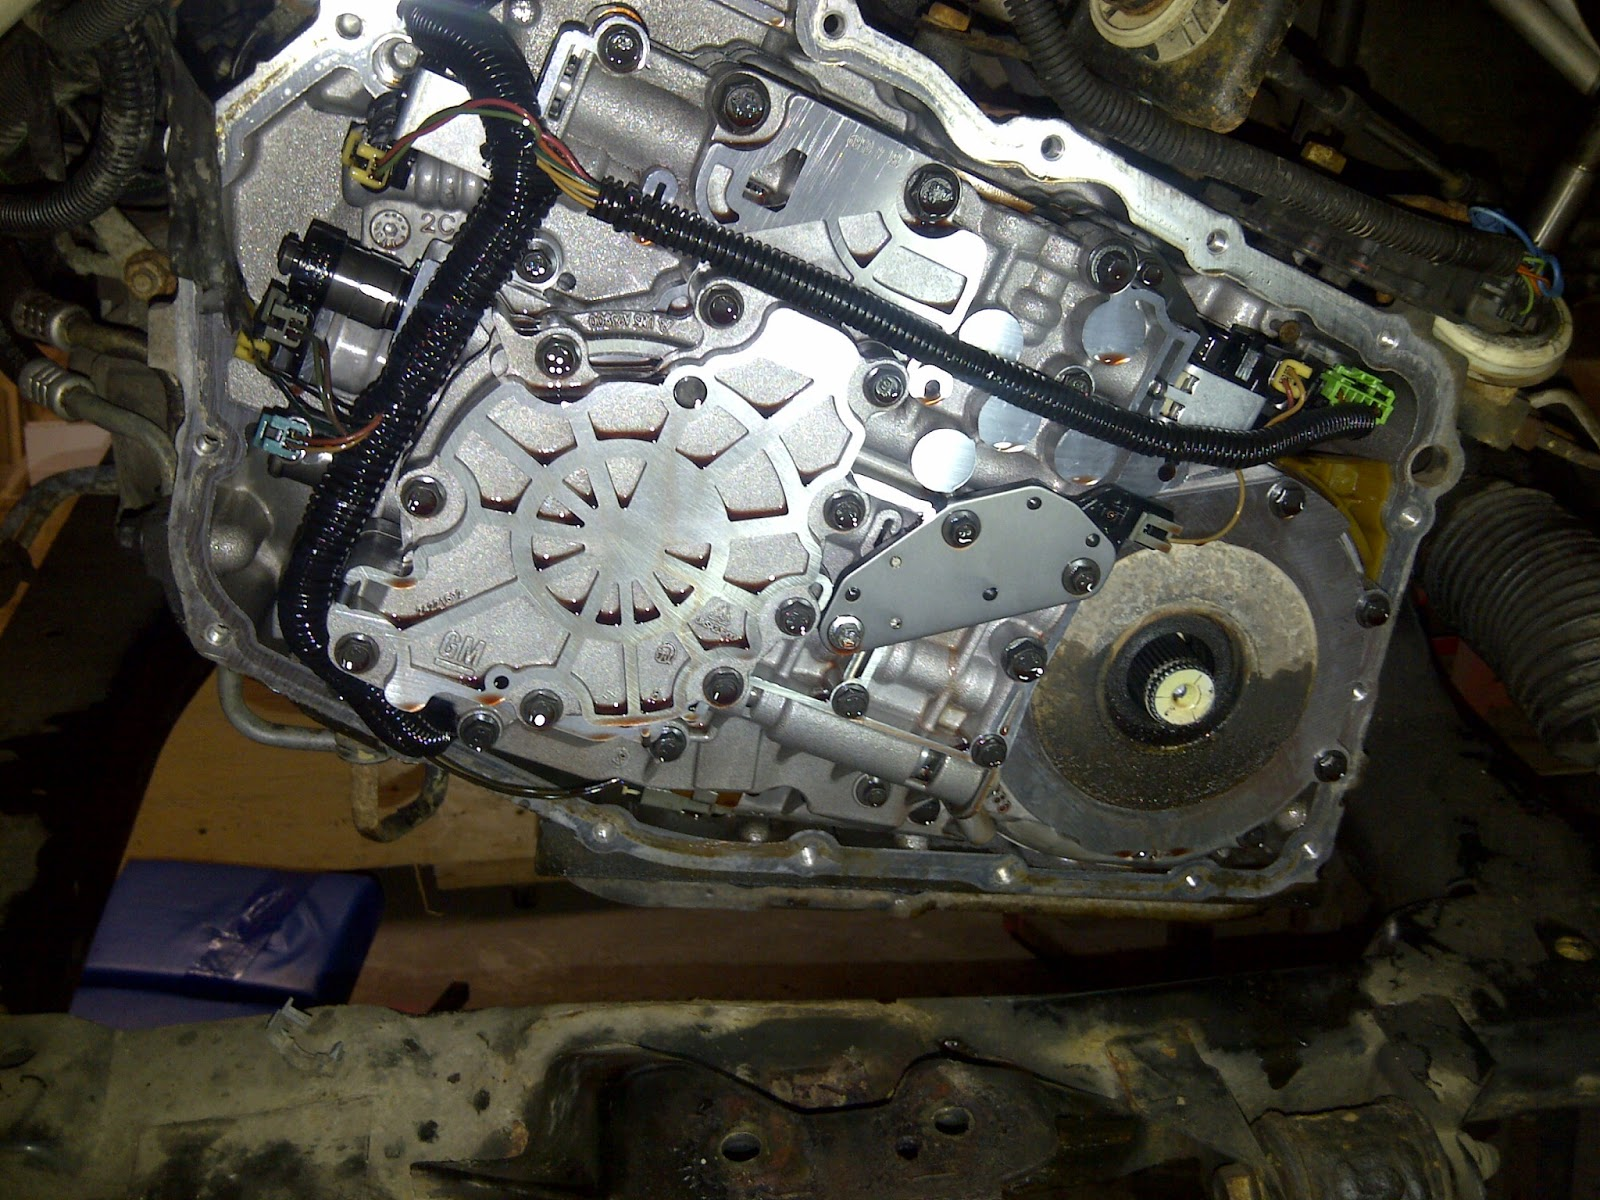 2001 pontiac montana engine diagram bmw wiring diagrams saturn sl1 transmission